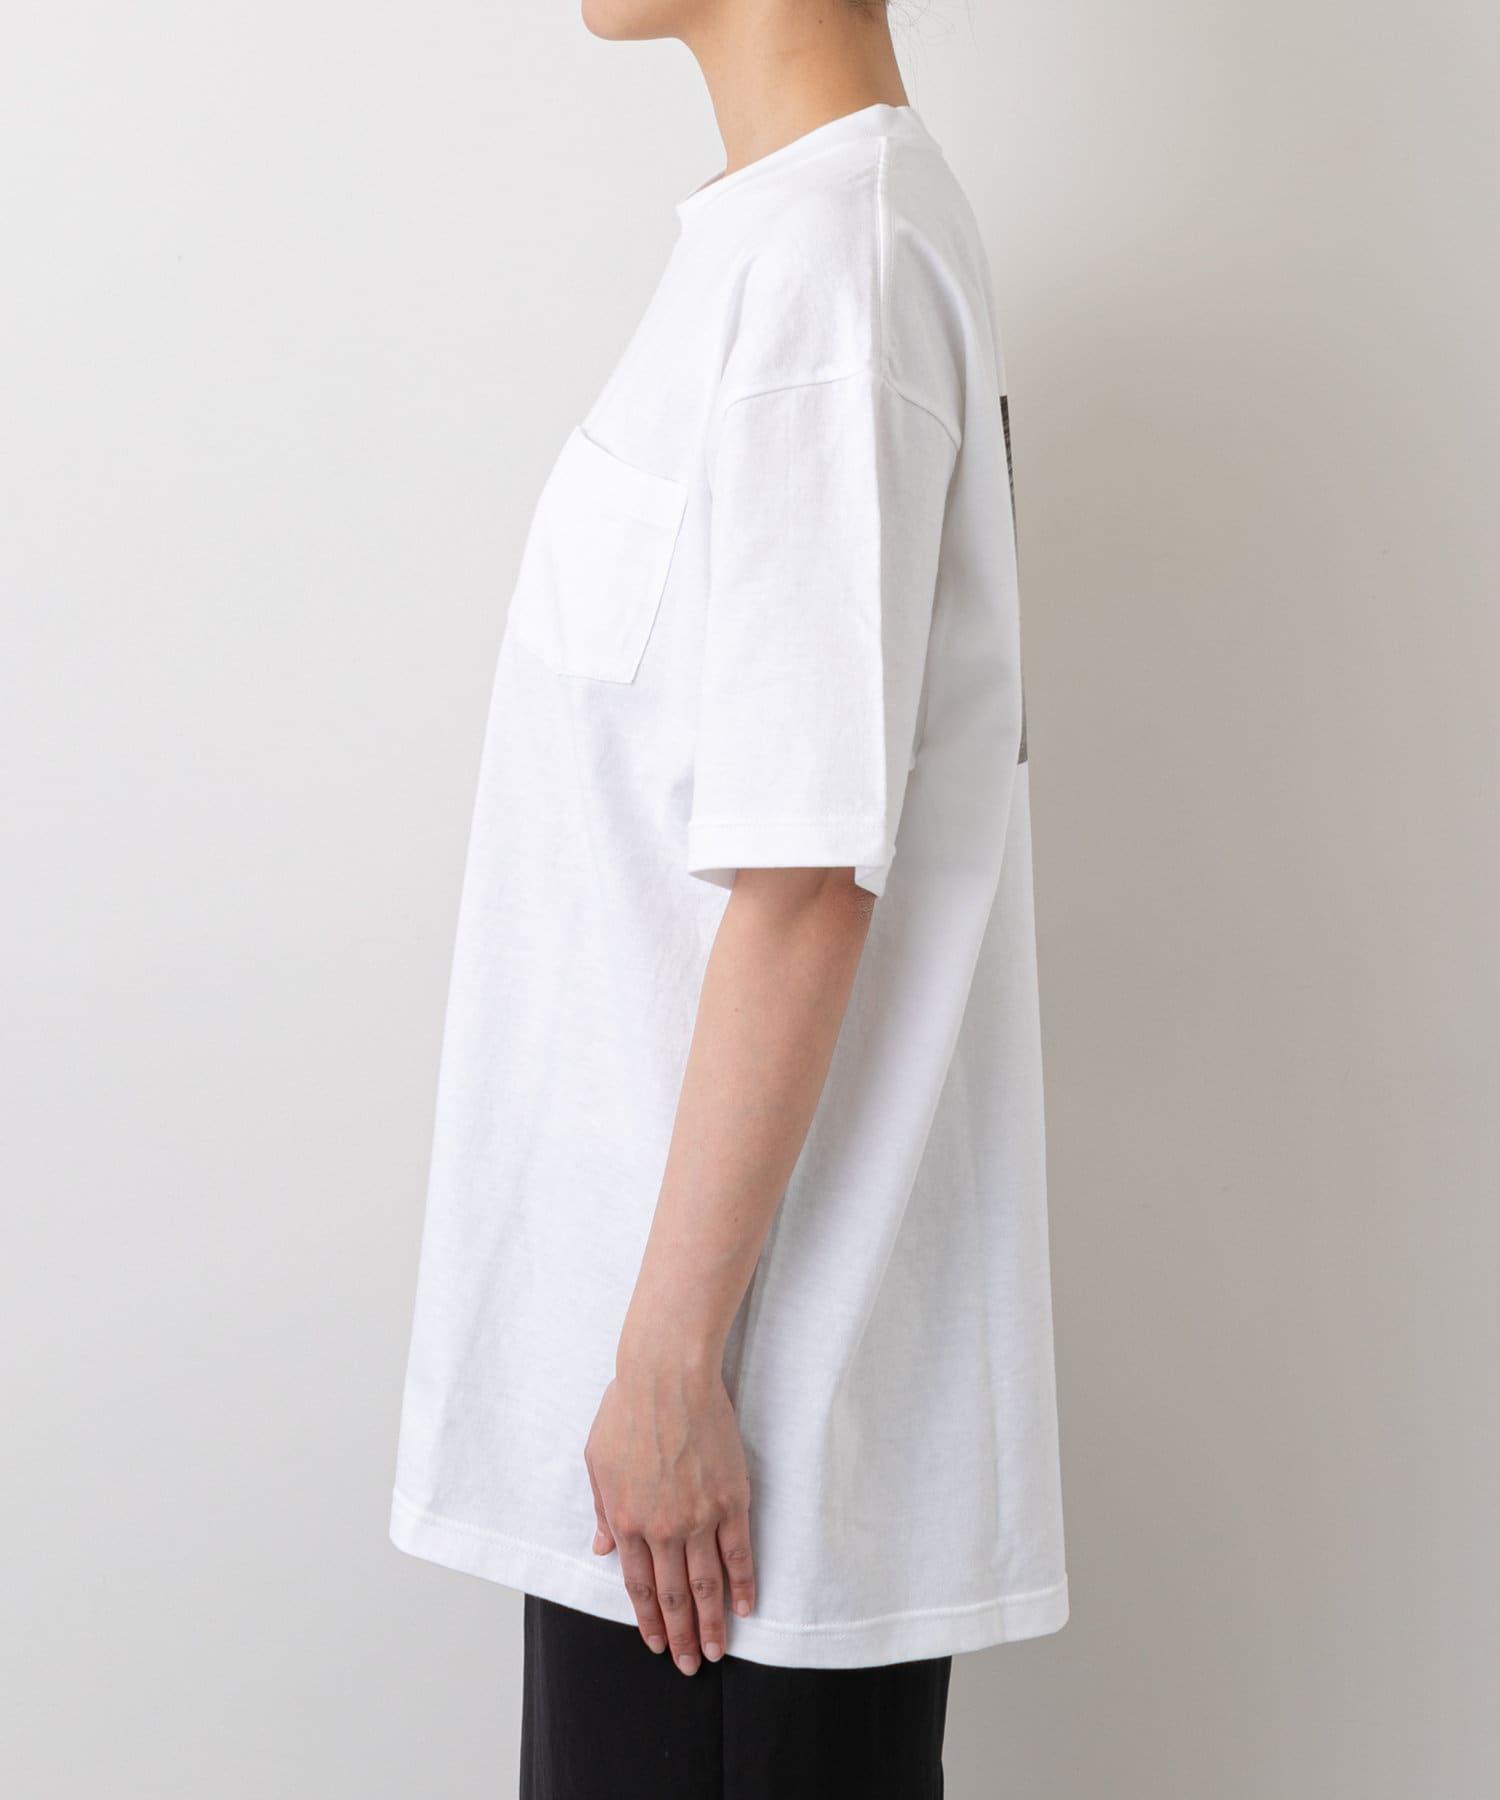 GALLARDAGALANTE(ガリャルダガランテ) バックフォトTシャツ【オンラインストア限定商品】